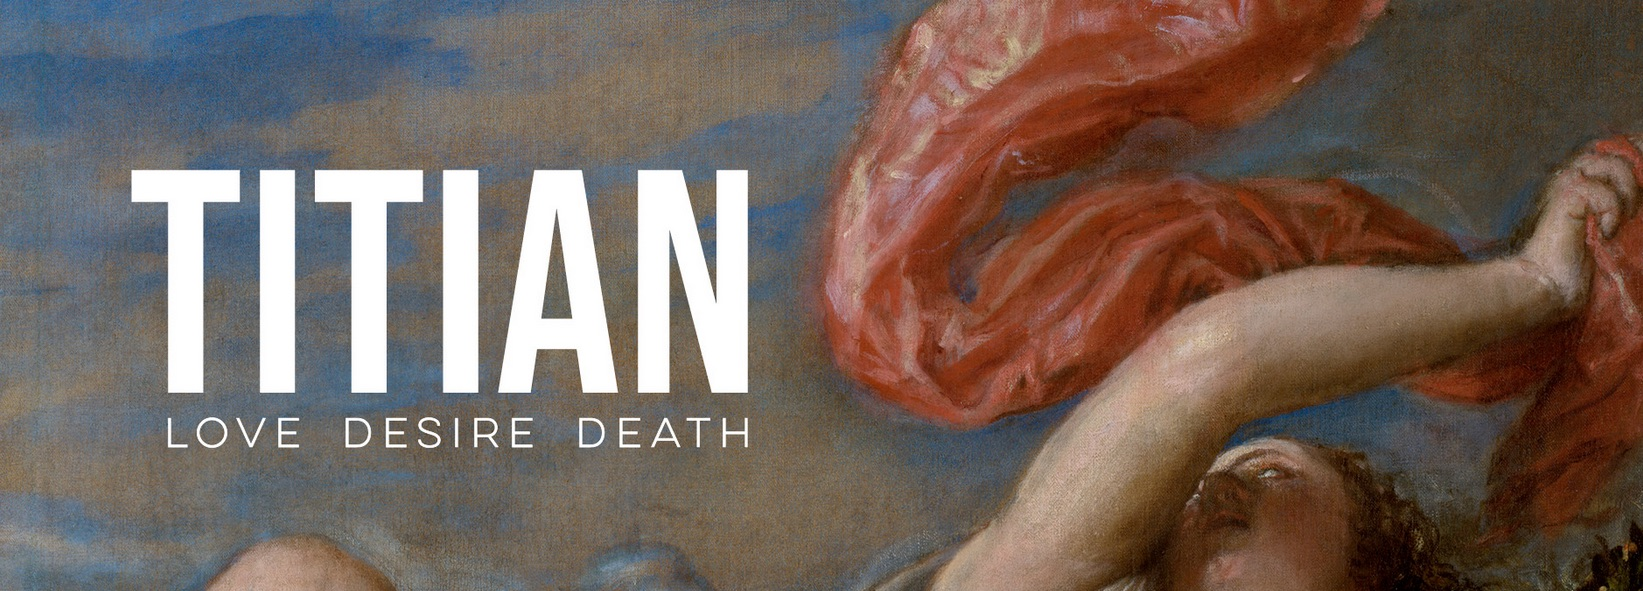 National Gallery - Titian: Love, Desire, Death